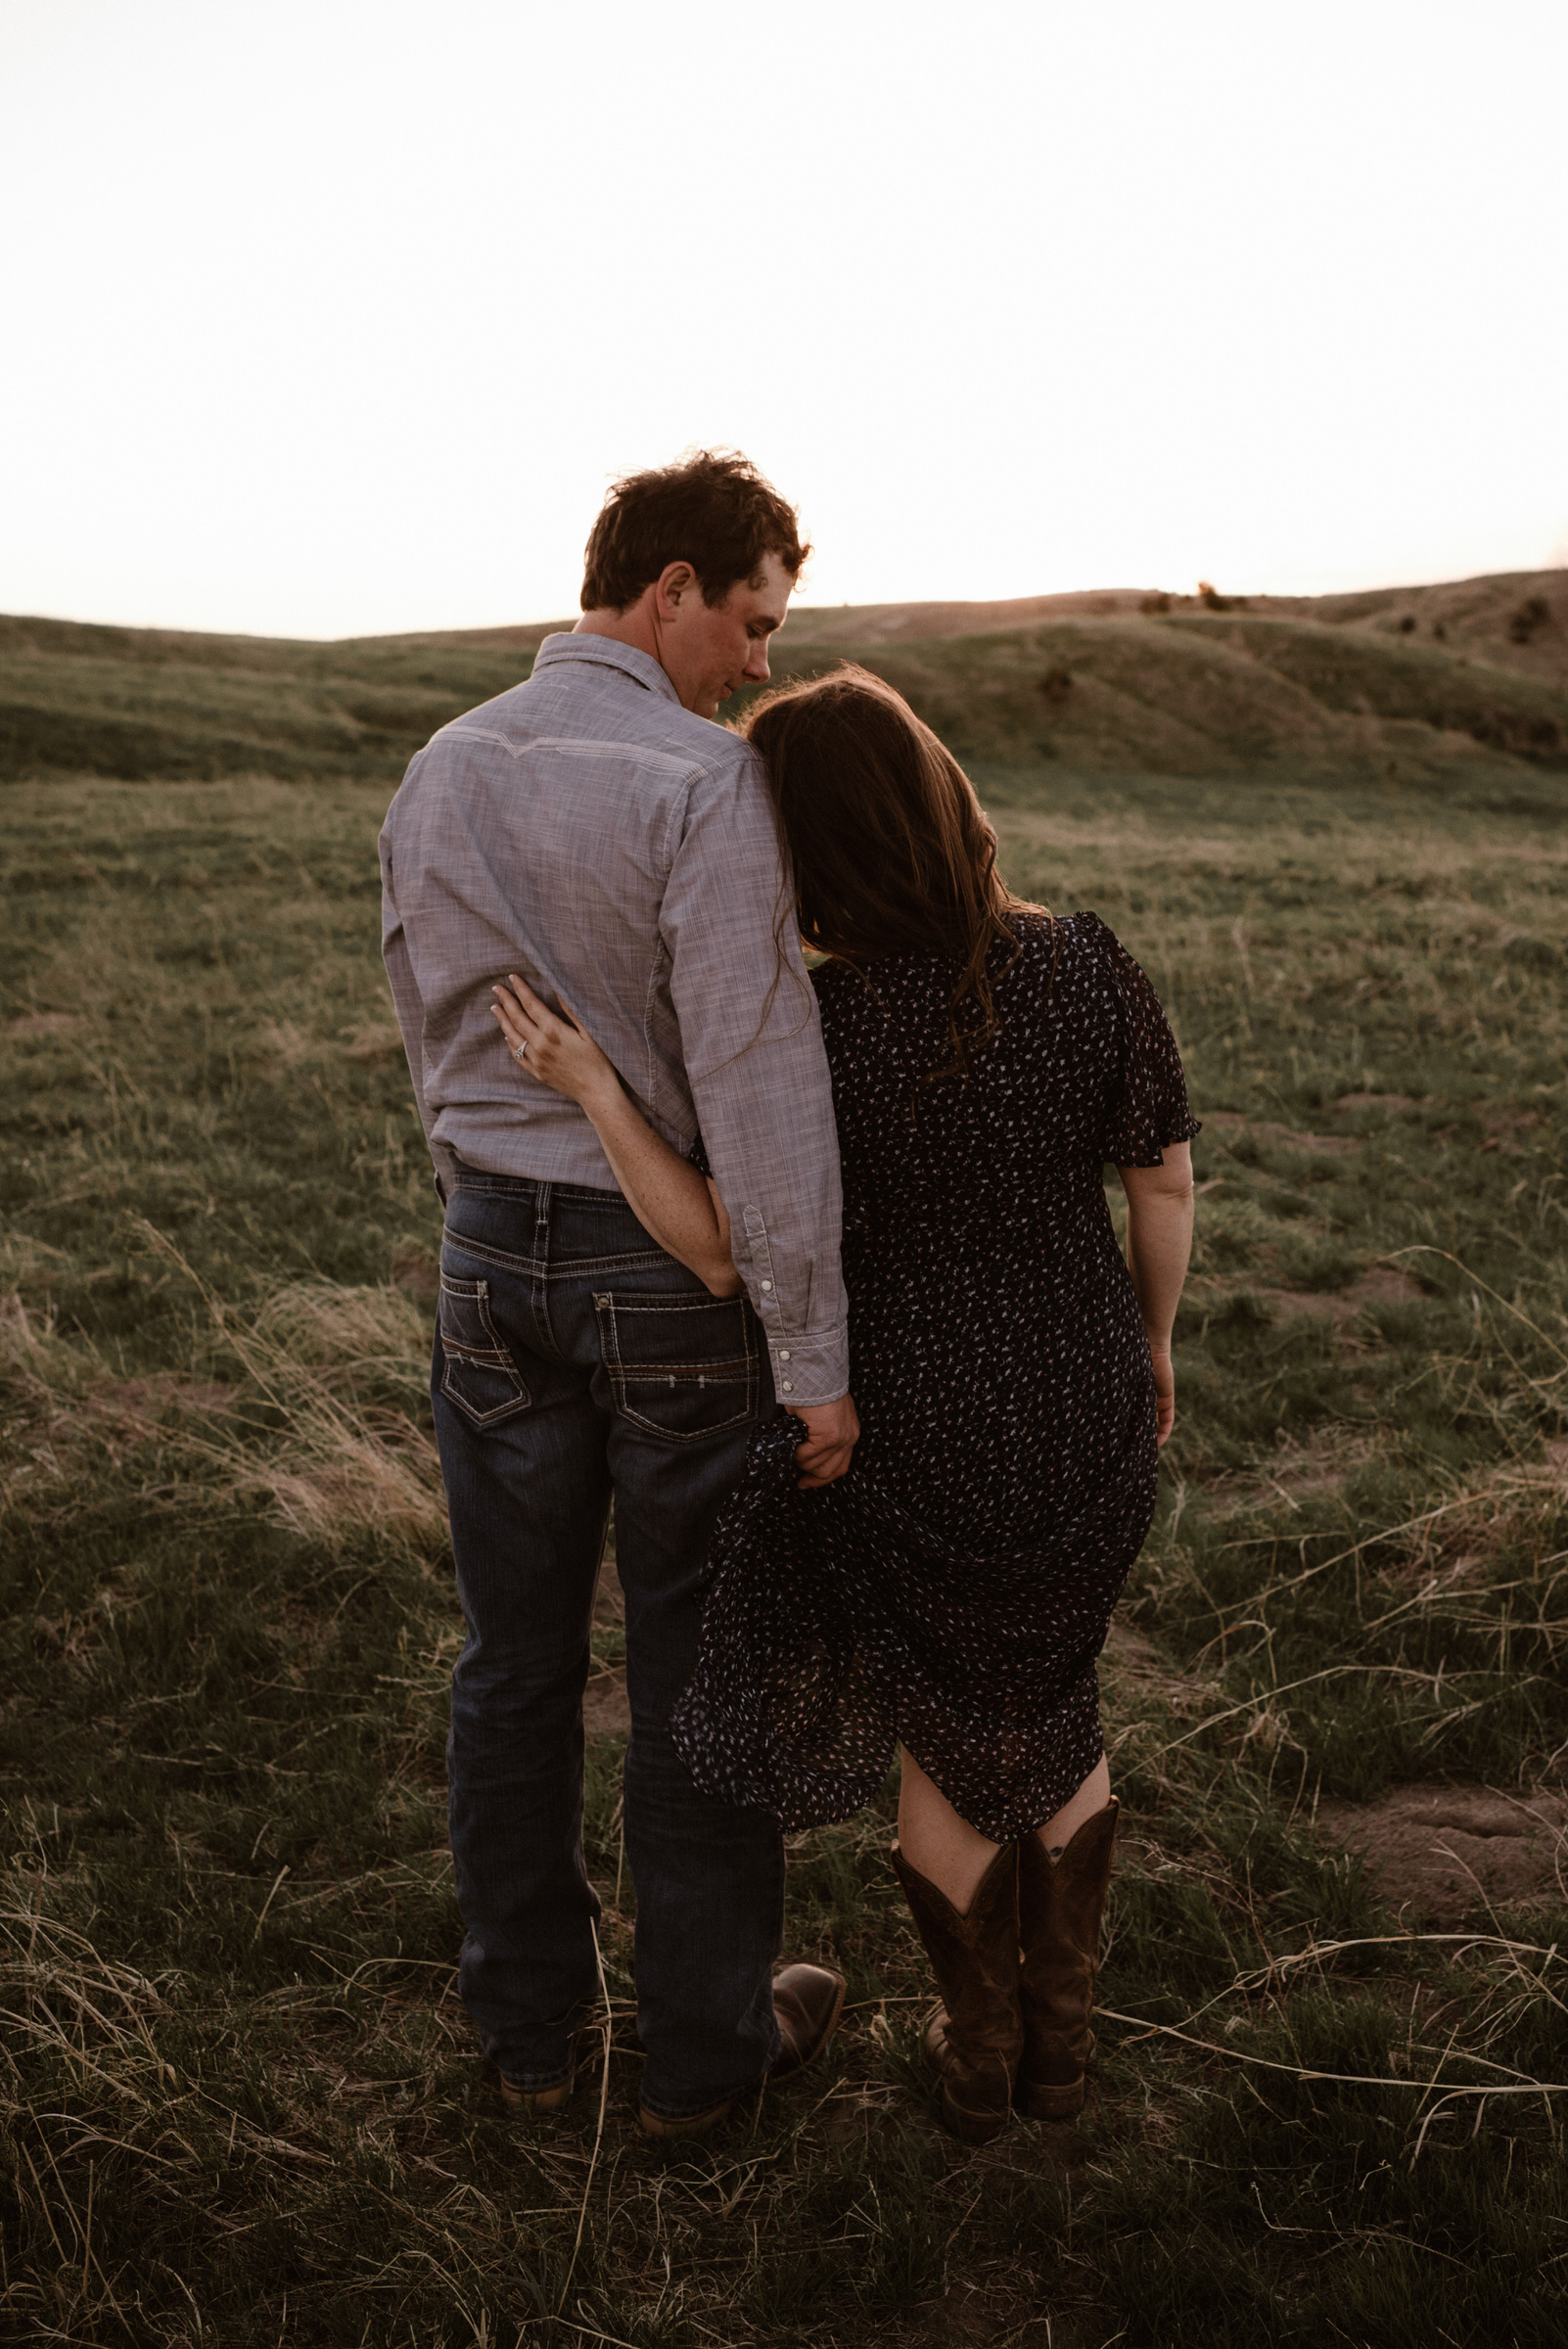 Sandhills-Nebraska-Engagement-Wedding-Photographer-Kaylie-Sirek-Photography-042.jpg